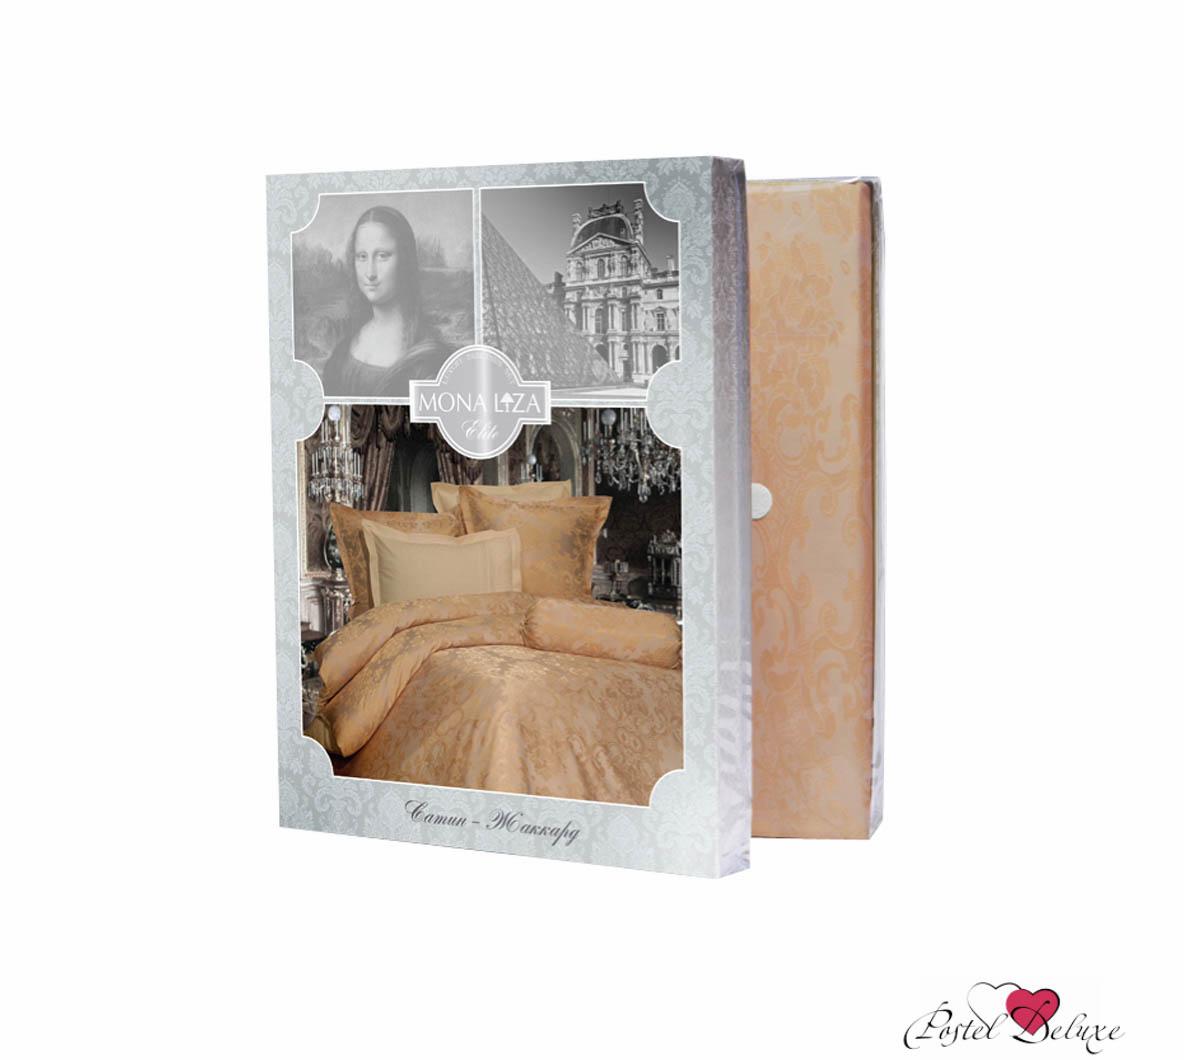 Постельное белье Mona Liza Постельное белье Madam Stuart (2 сп. евро) комплект пб 2 сп mona liza сатин жаккард royal 4 нав 2шт 70х70 и 2 шт